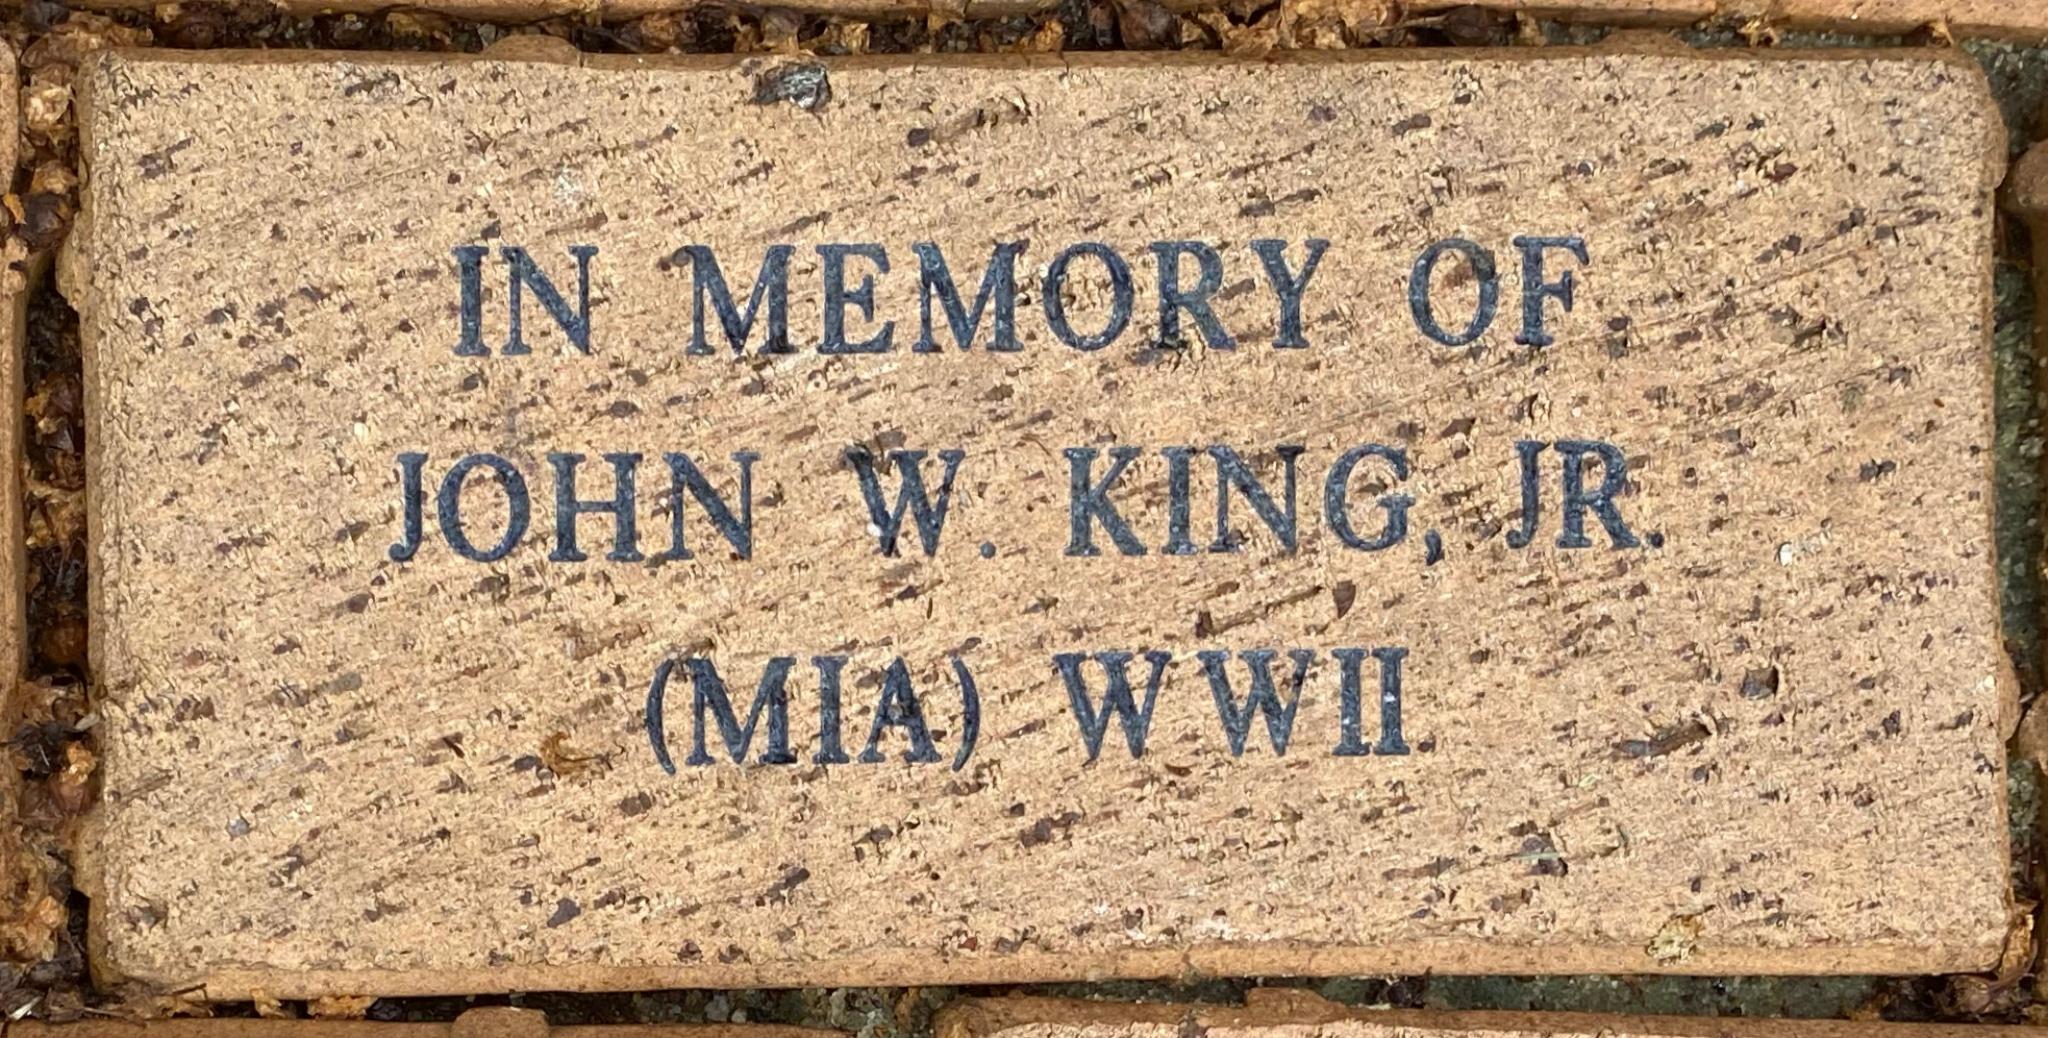 IN MEMORY OF  JOHN W. KING, JR. (MIA) WWII